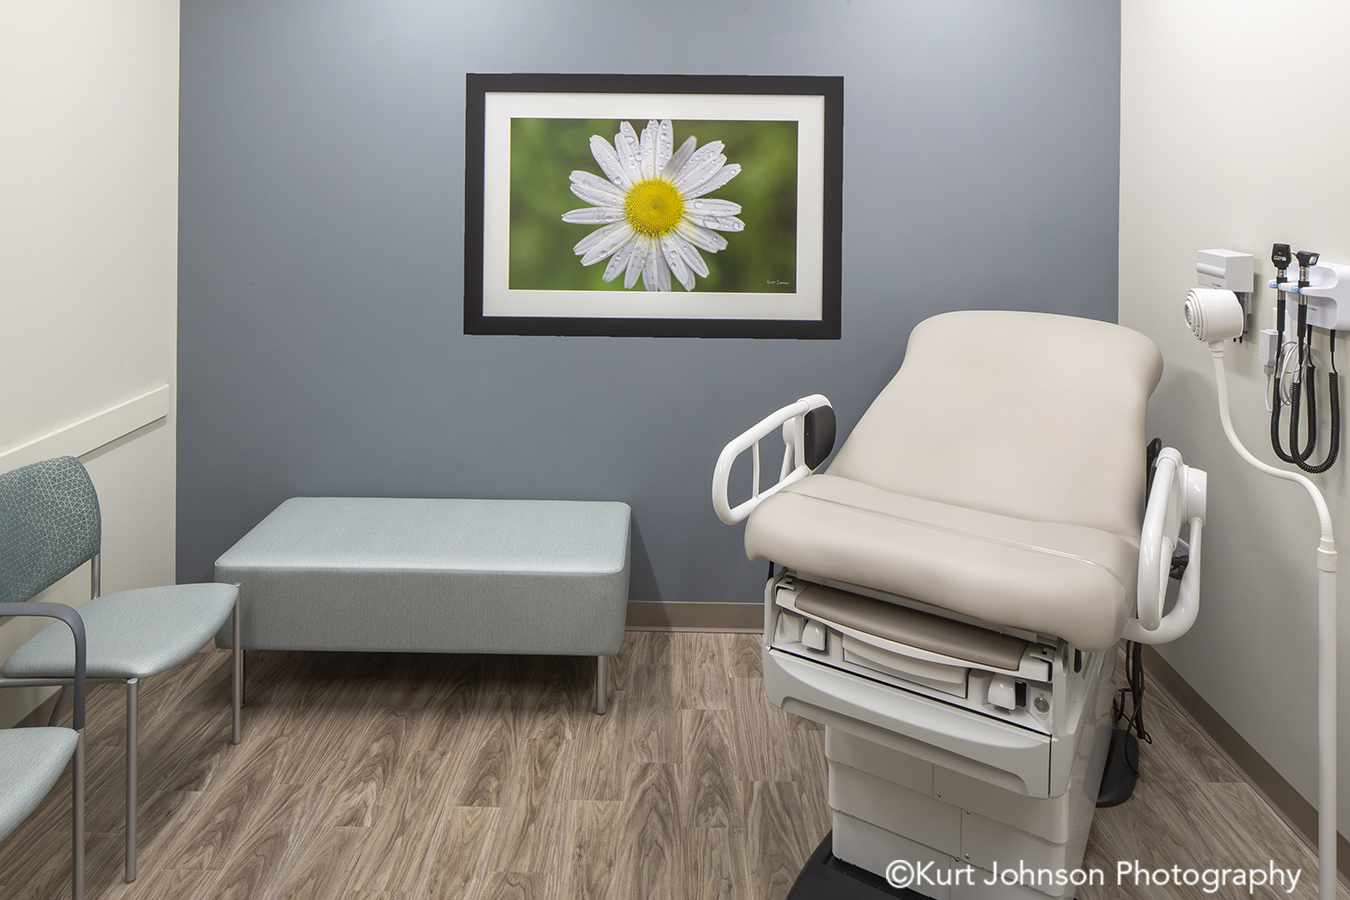 allina health healthcare install installation framed matte landscape art